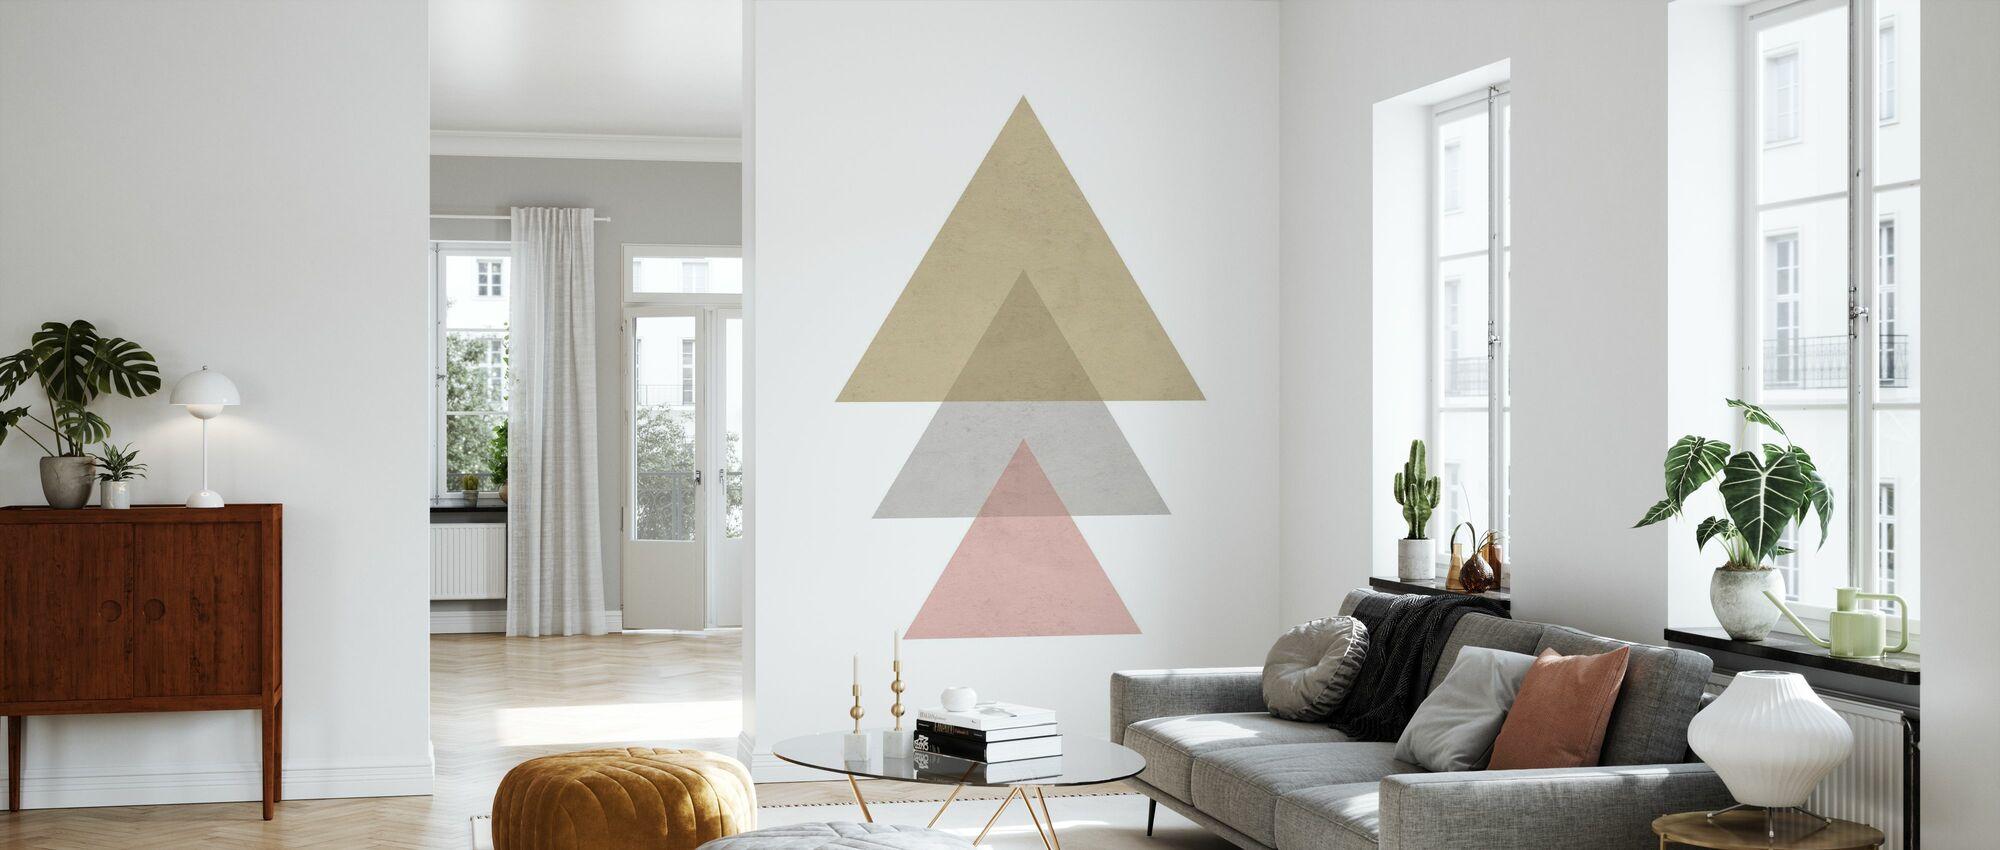 Driehoeken - Roze - Behang - Woonkamer